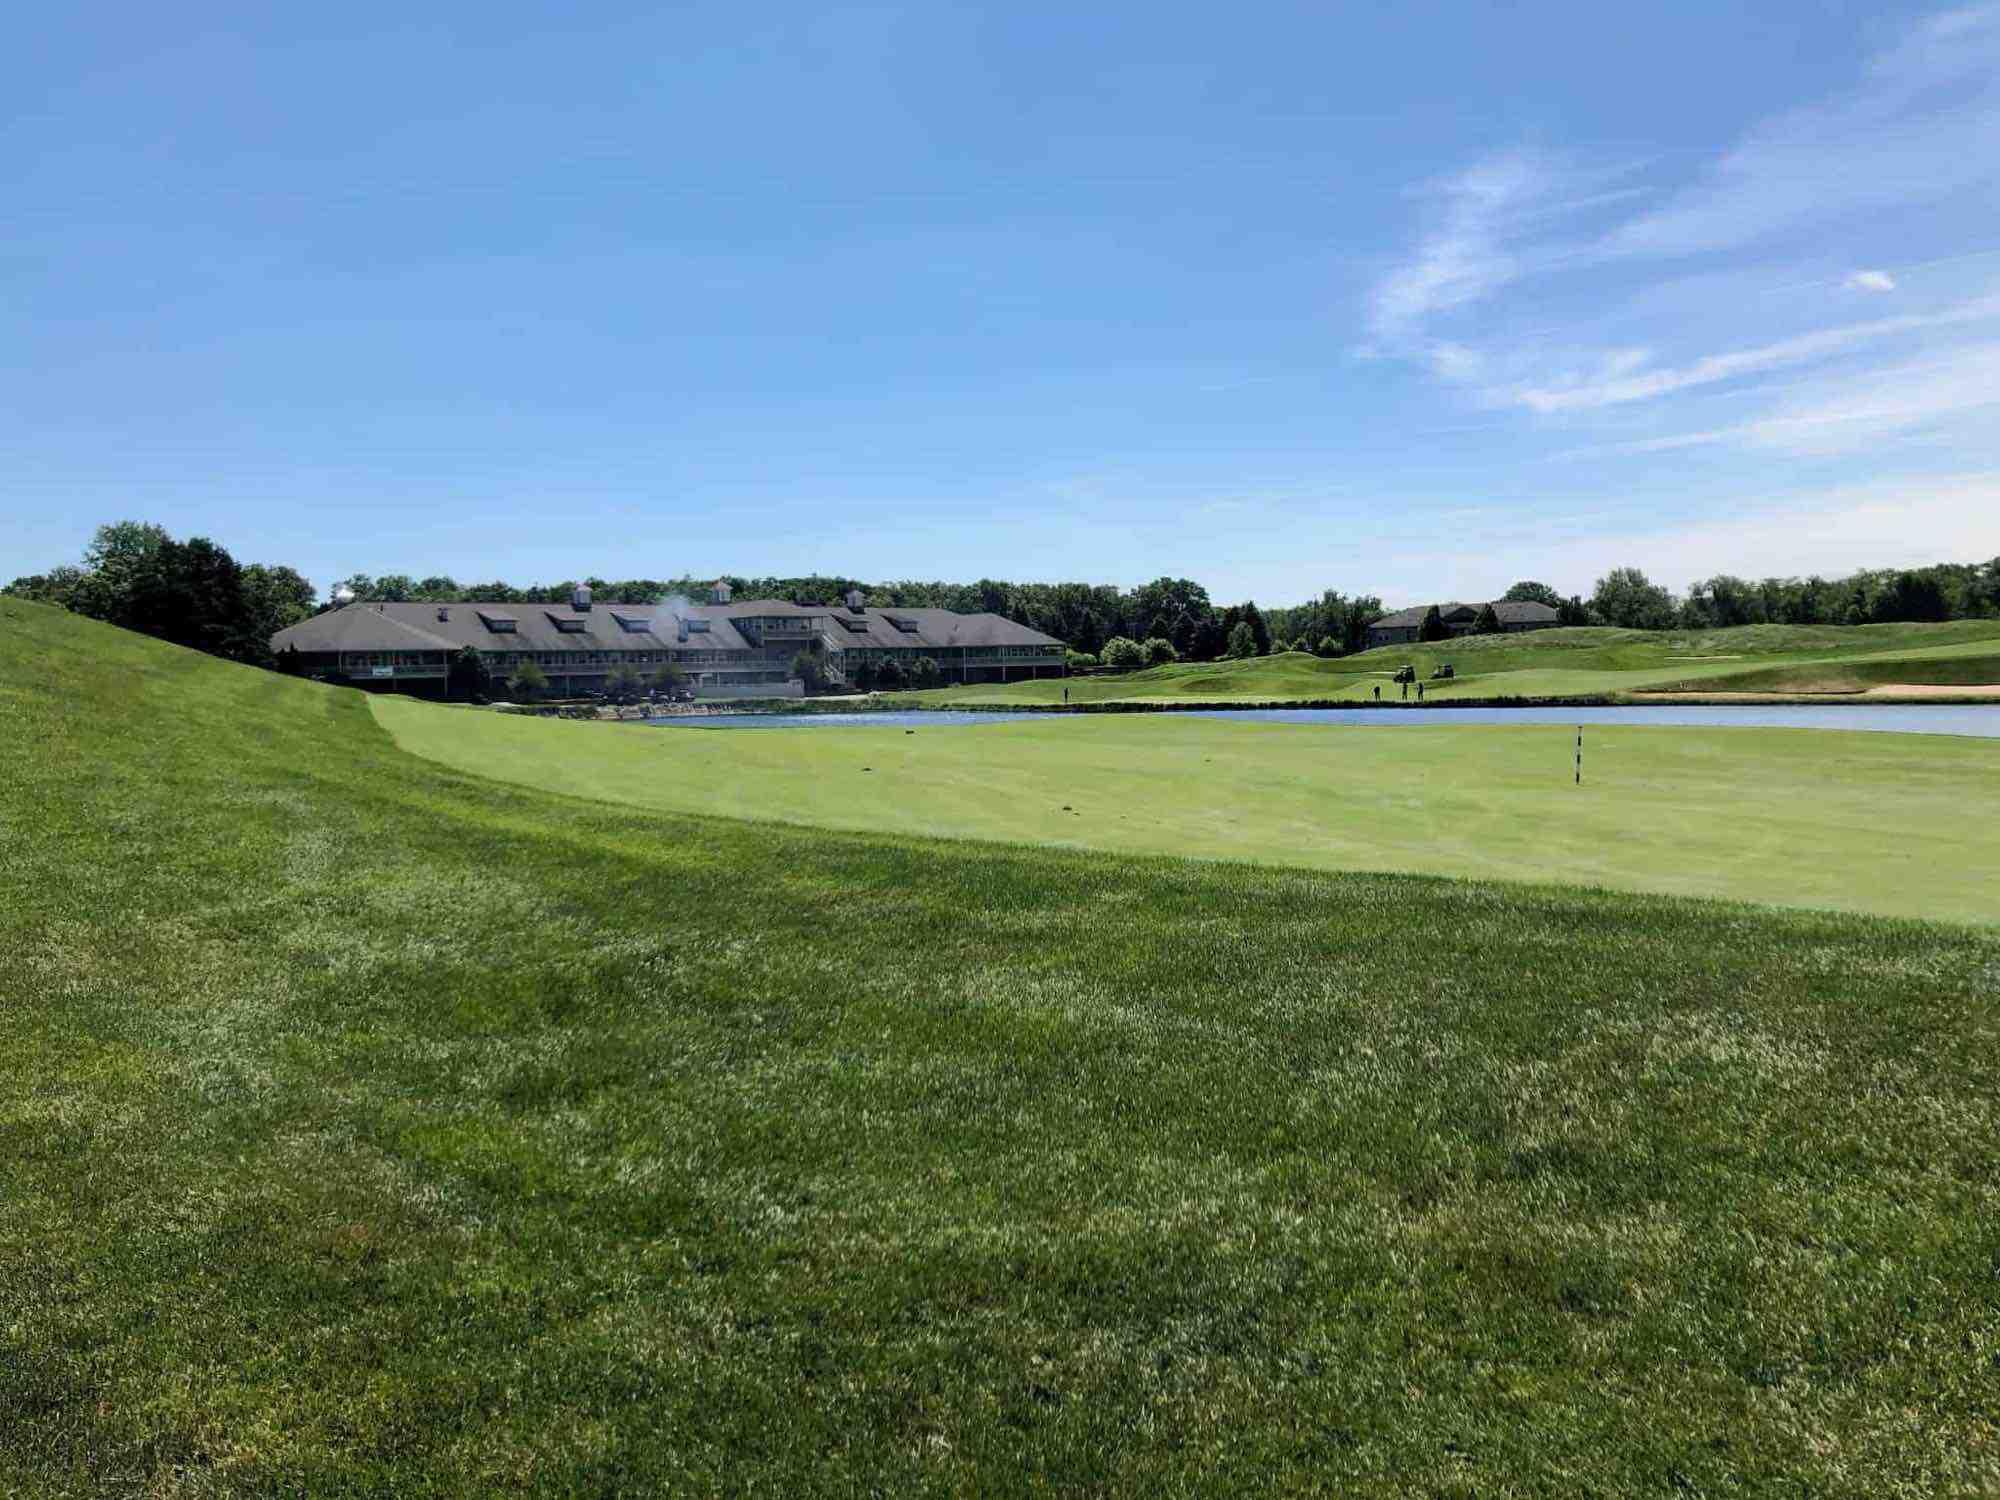 GOLF CLASSIC 2018: Golf Course